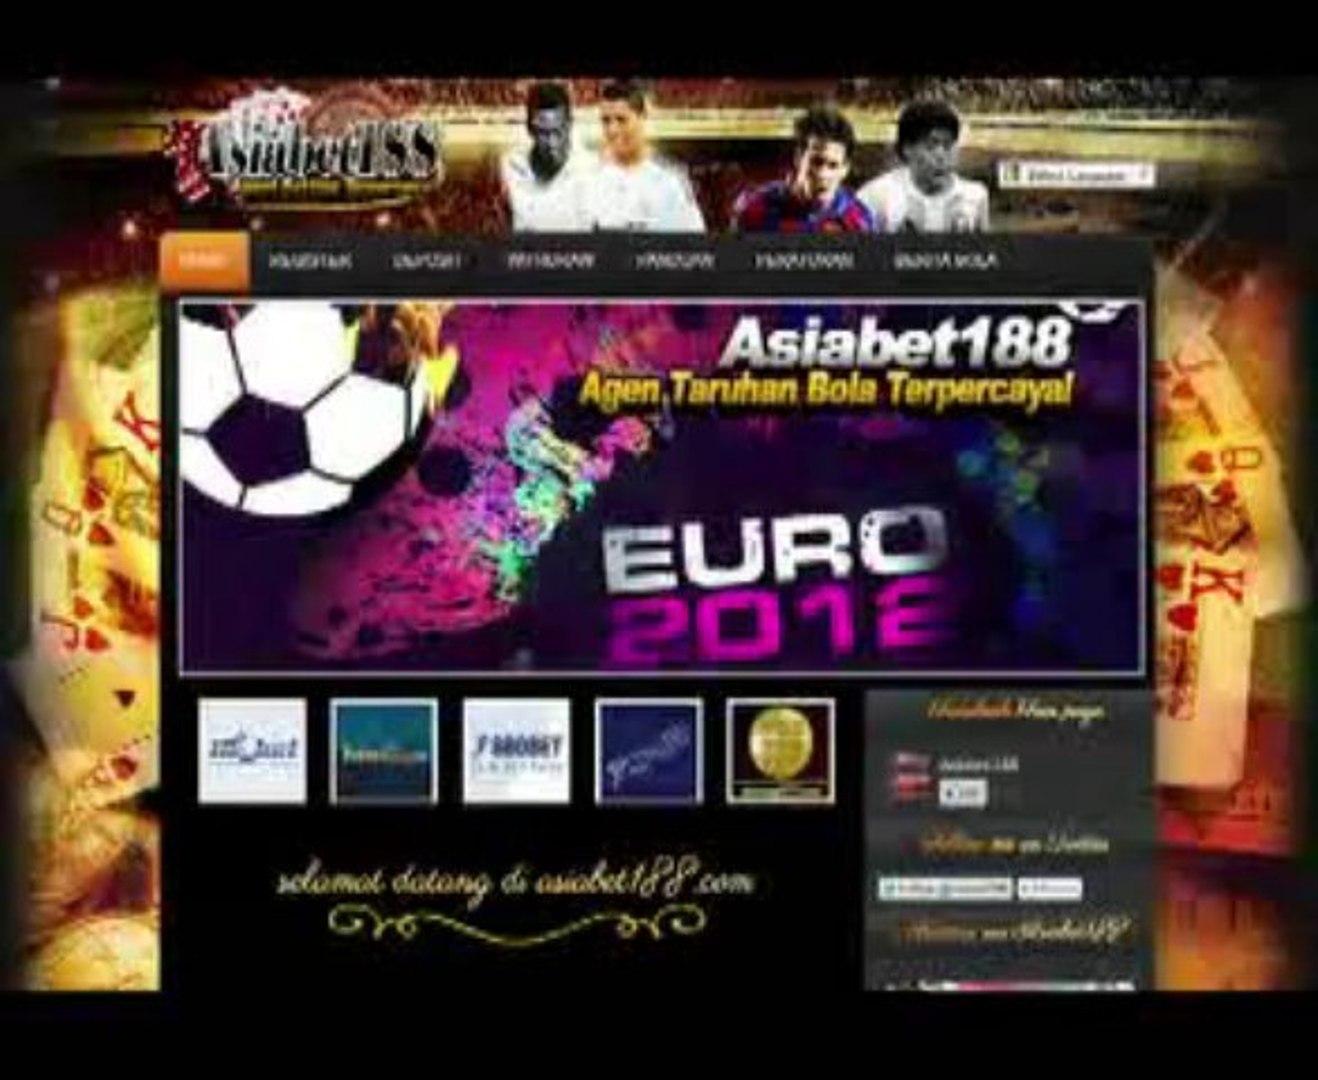 BOLA368.com Agen Judi Bola Terpercaya Promo 10% all Games Sportbook - Berita Kontes SEO